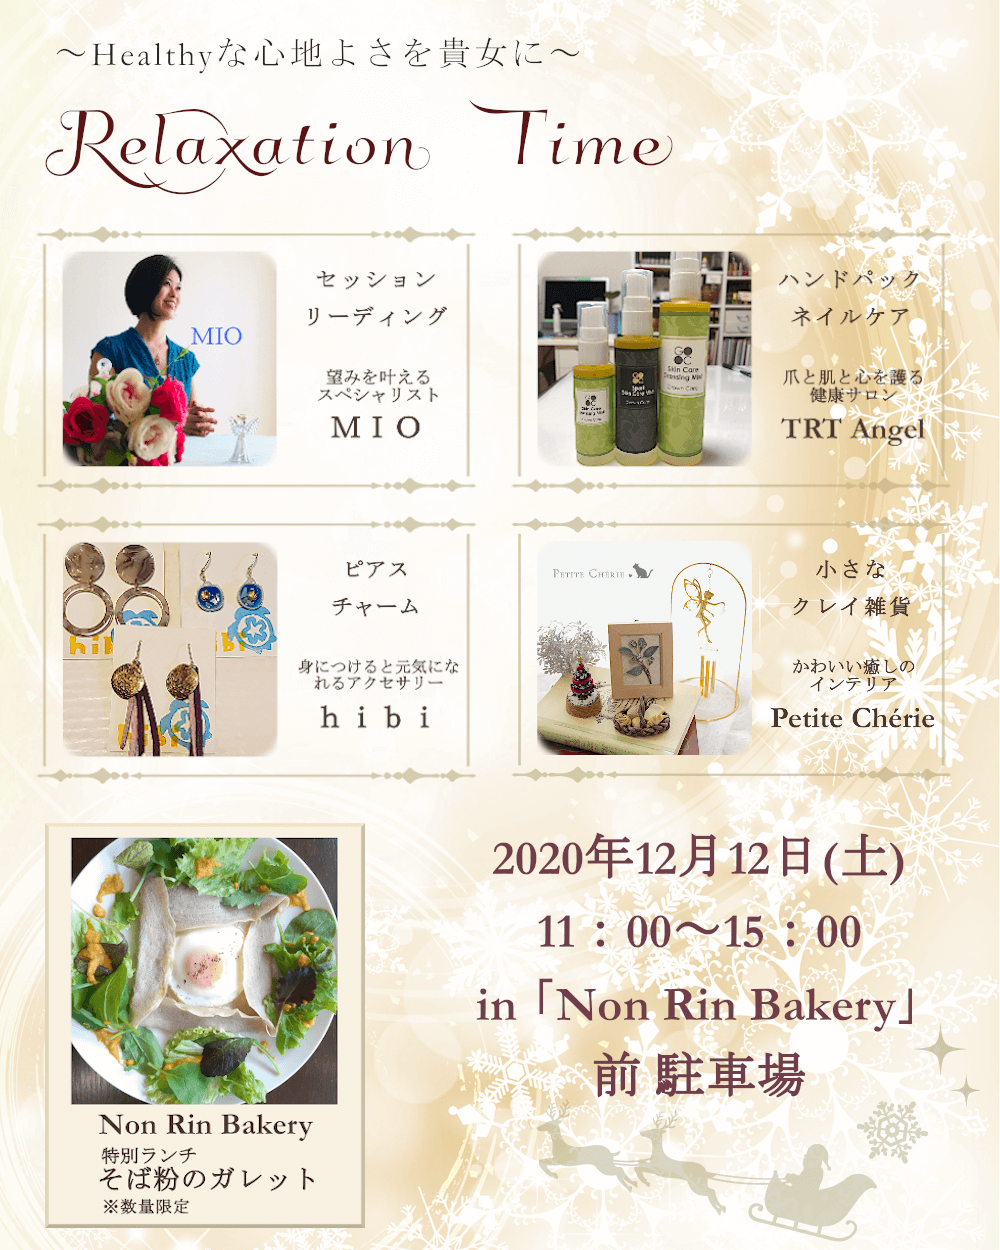 information_image2